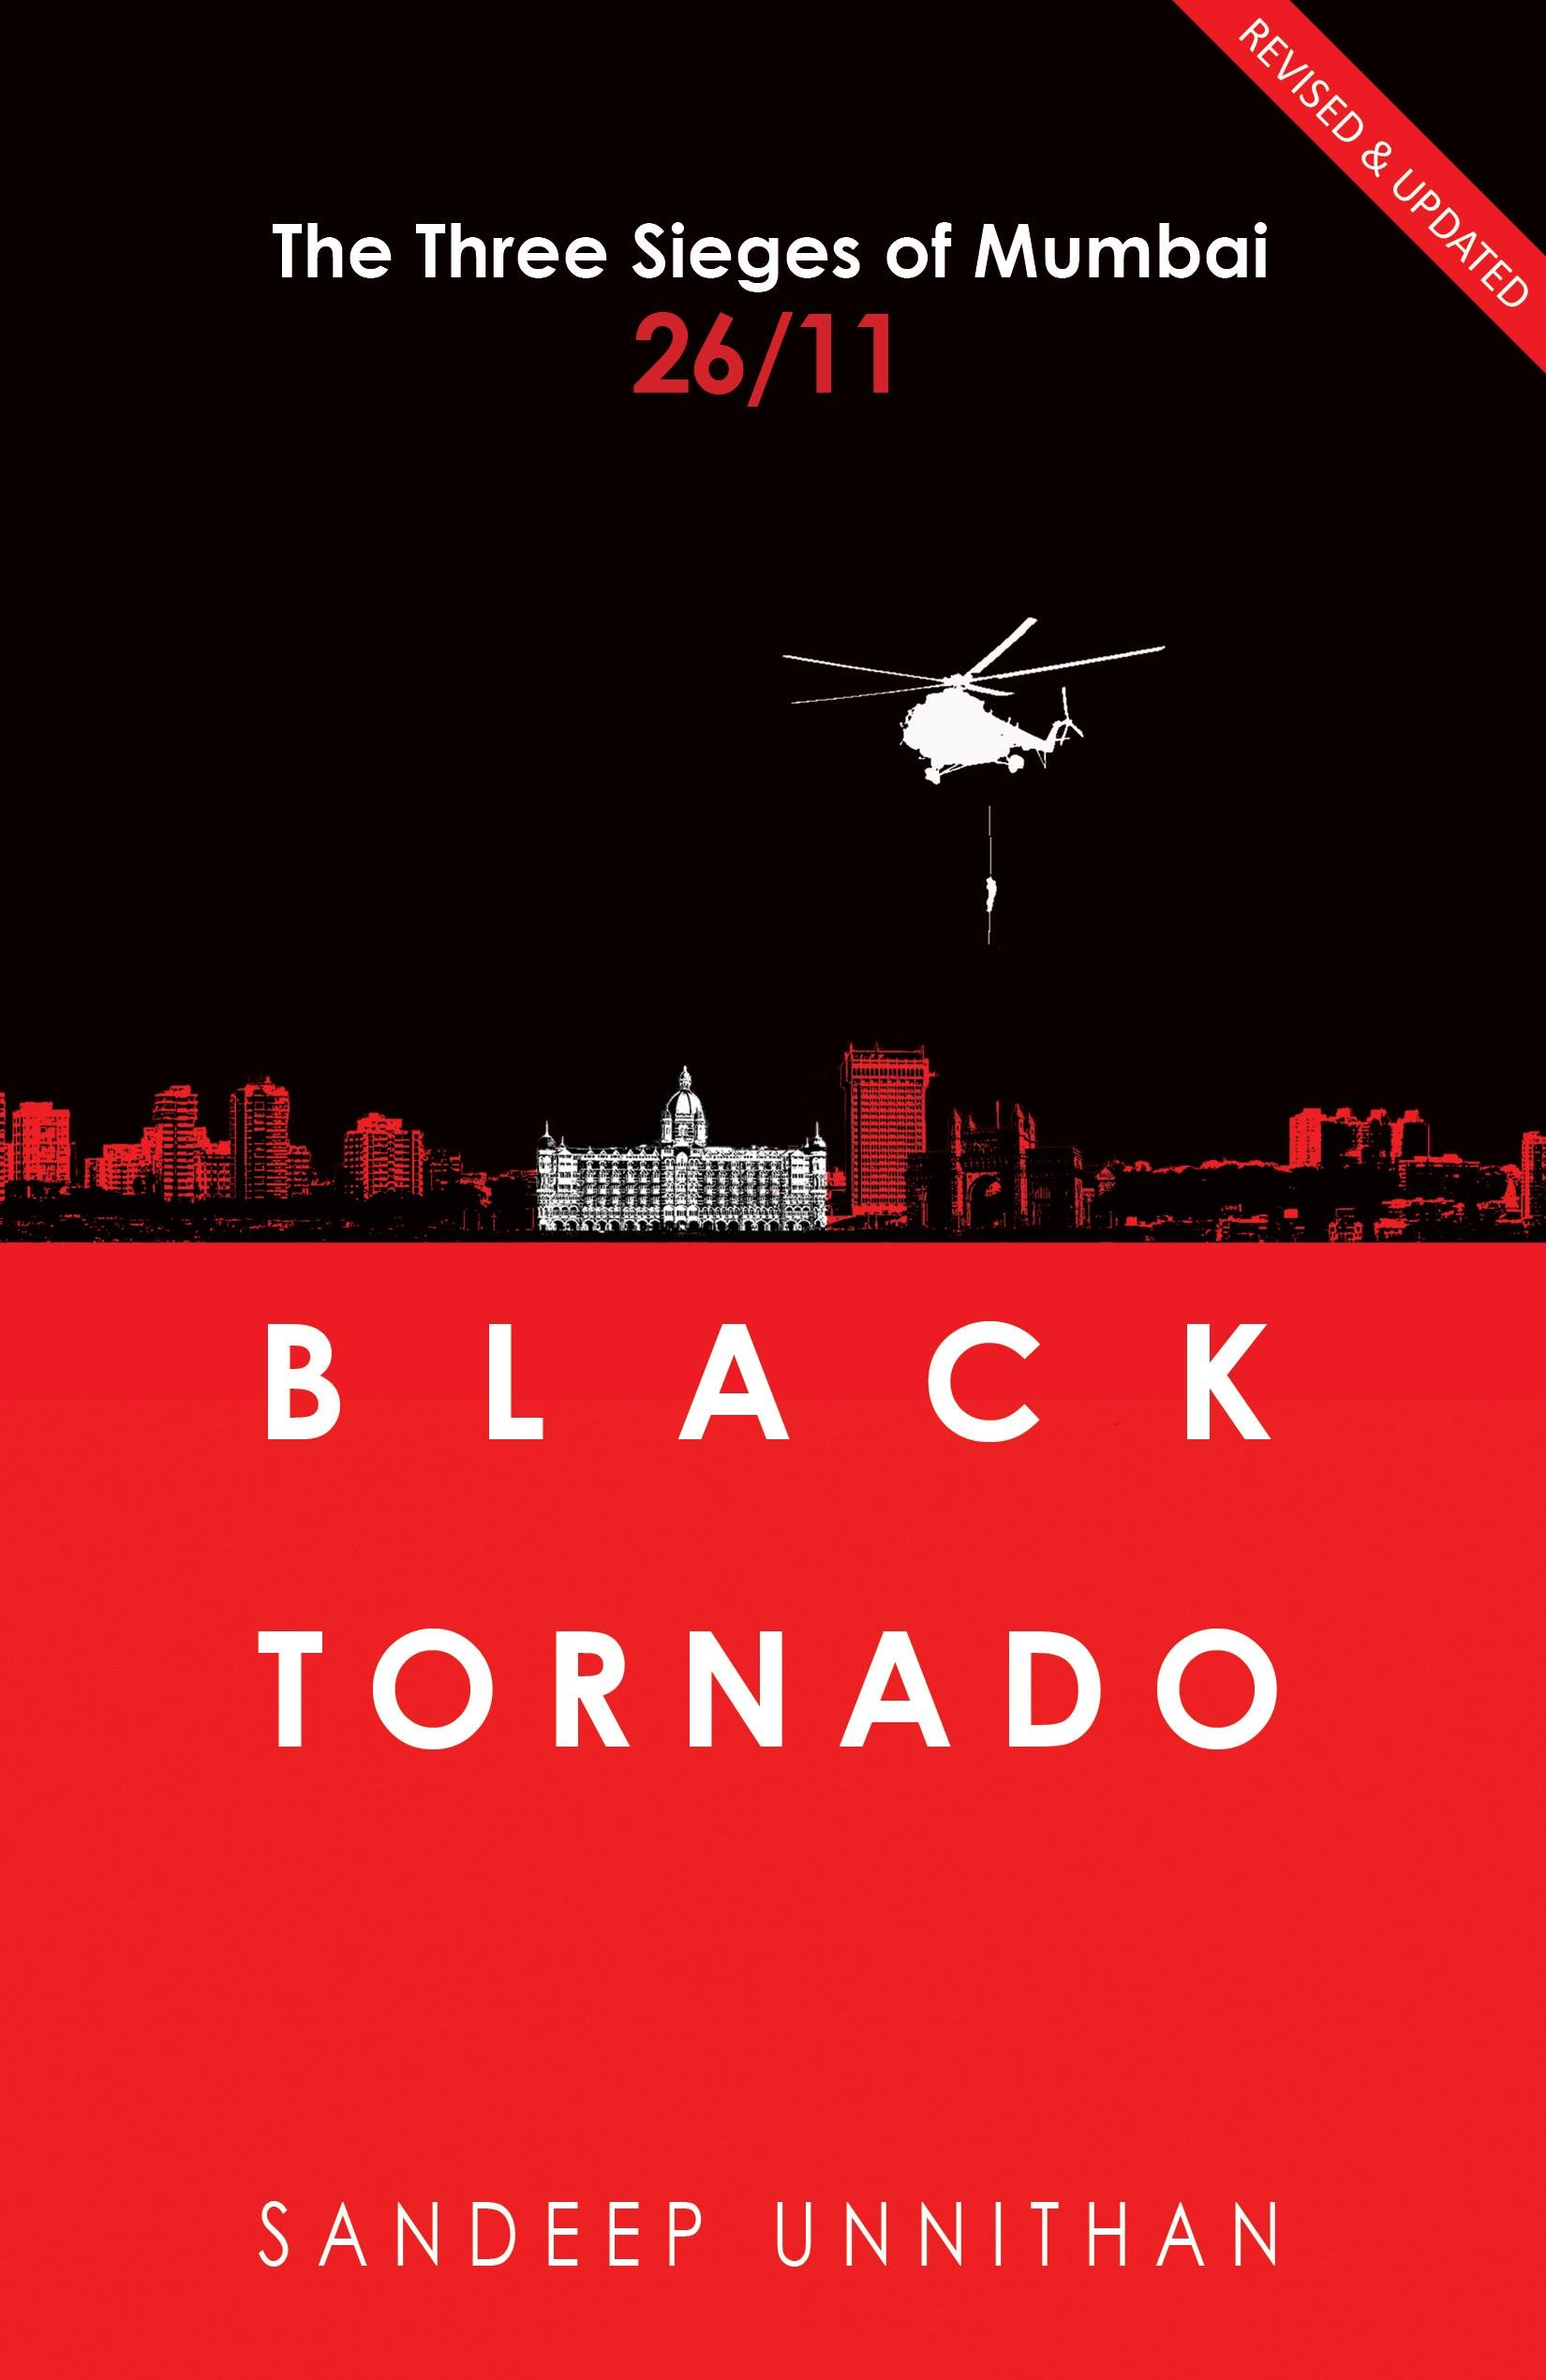 Black Tornado: The Three Sieges of Mumbai 26/11 ebook